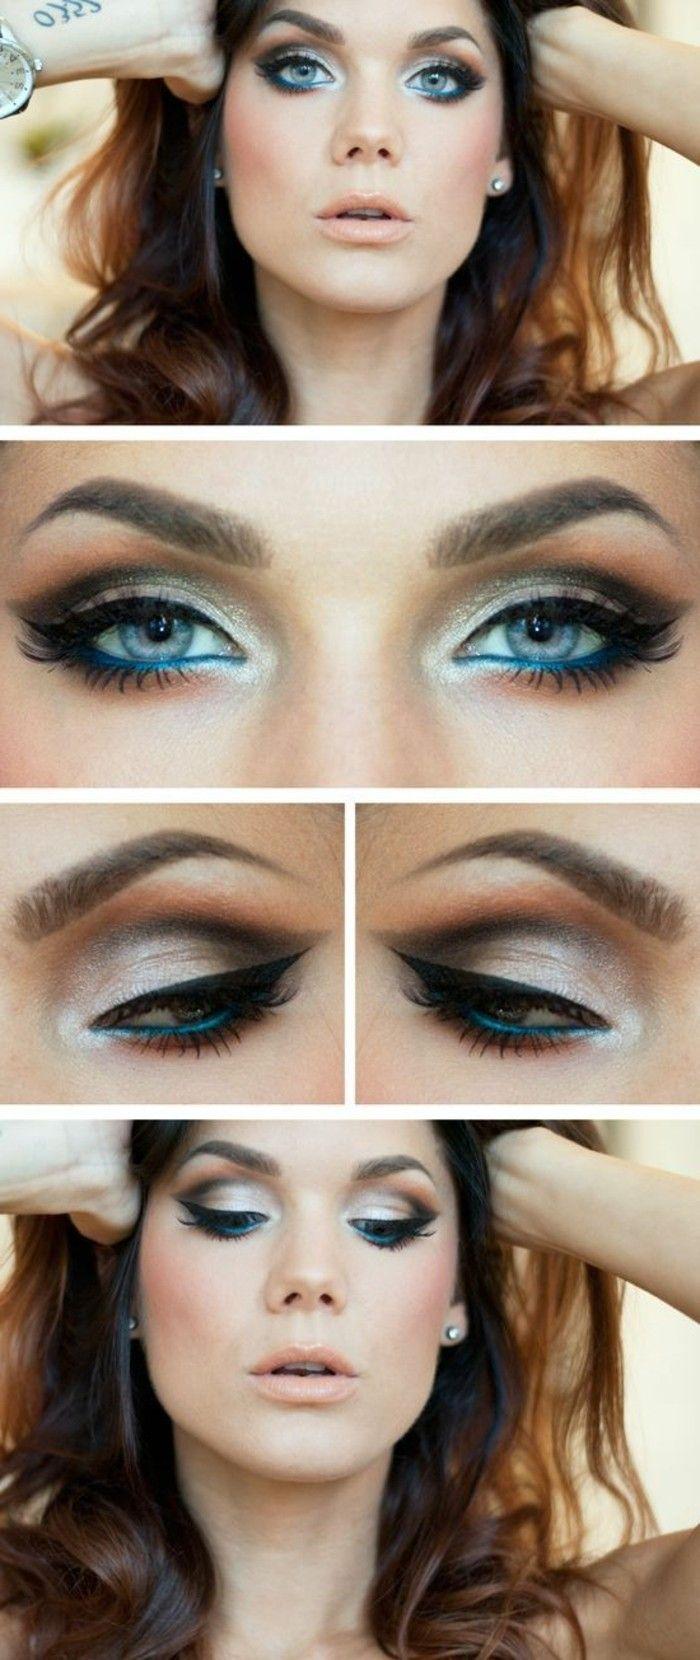 17 Meilleures Id Es Propos De Maquillage Yeux Bleus Sur Pinterest Maquillage Yeux Bleus